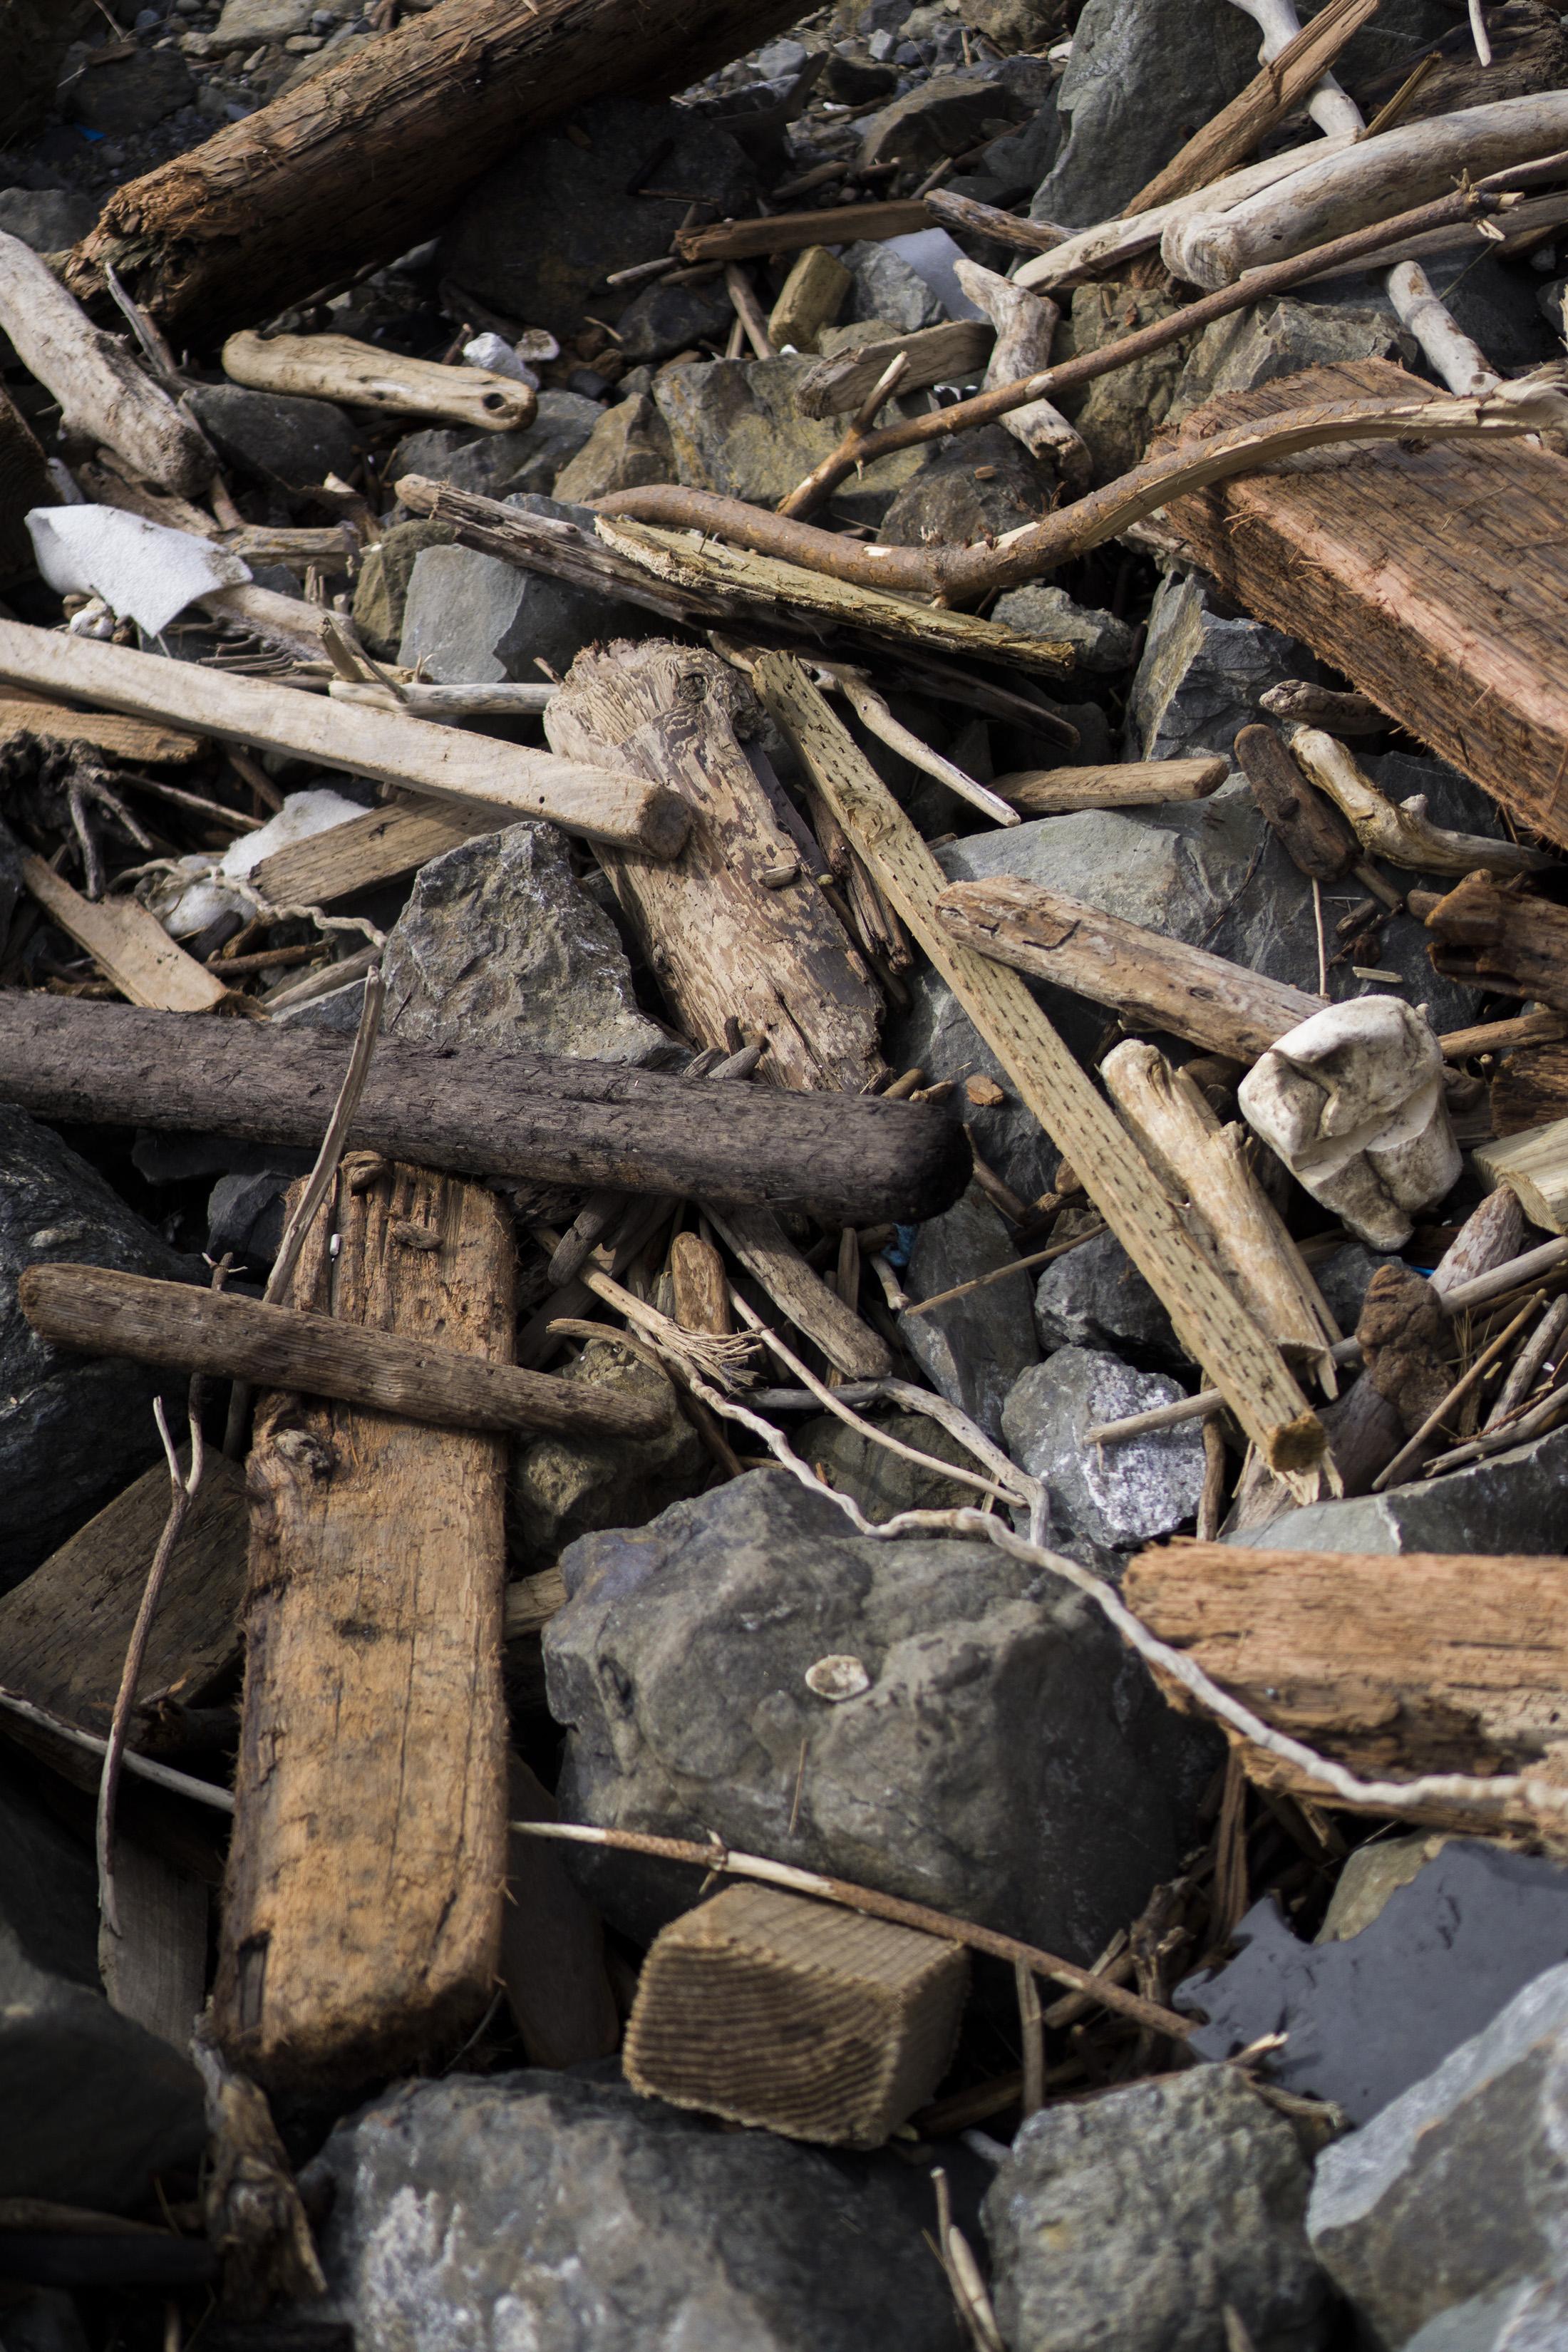 Detritus at Pirates Cove, Marin Headlands, Golden Gate National Recreation Area / Darker than Green